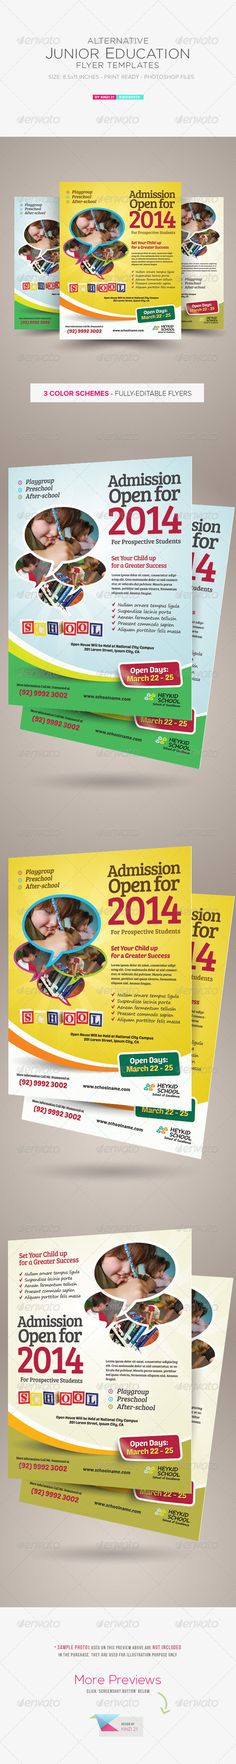 19 Best Preschool Flyer Design Ideas Images On Pinterest Flyer